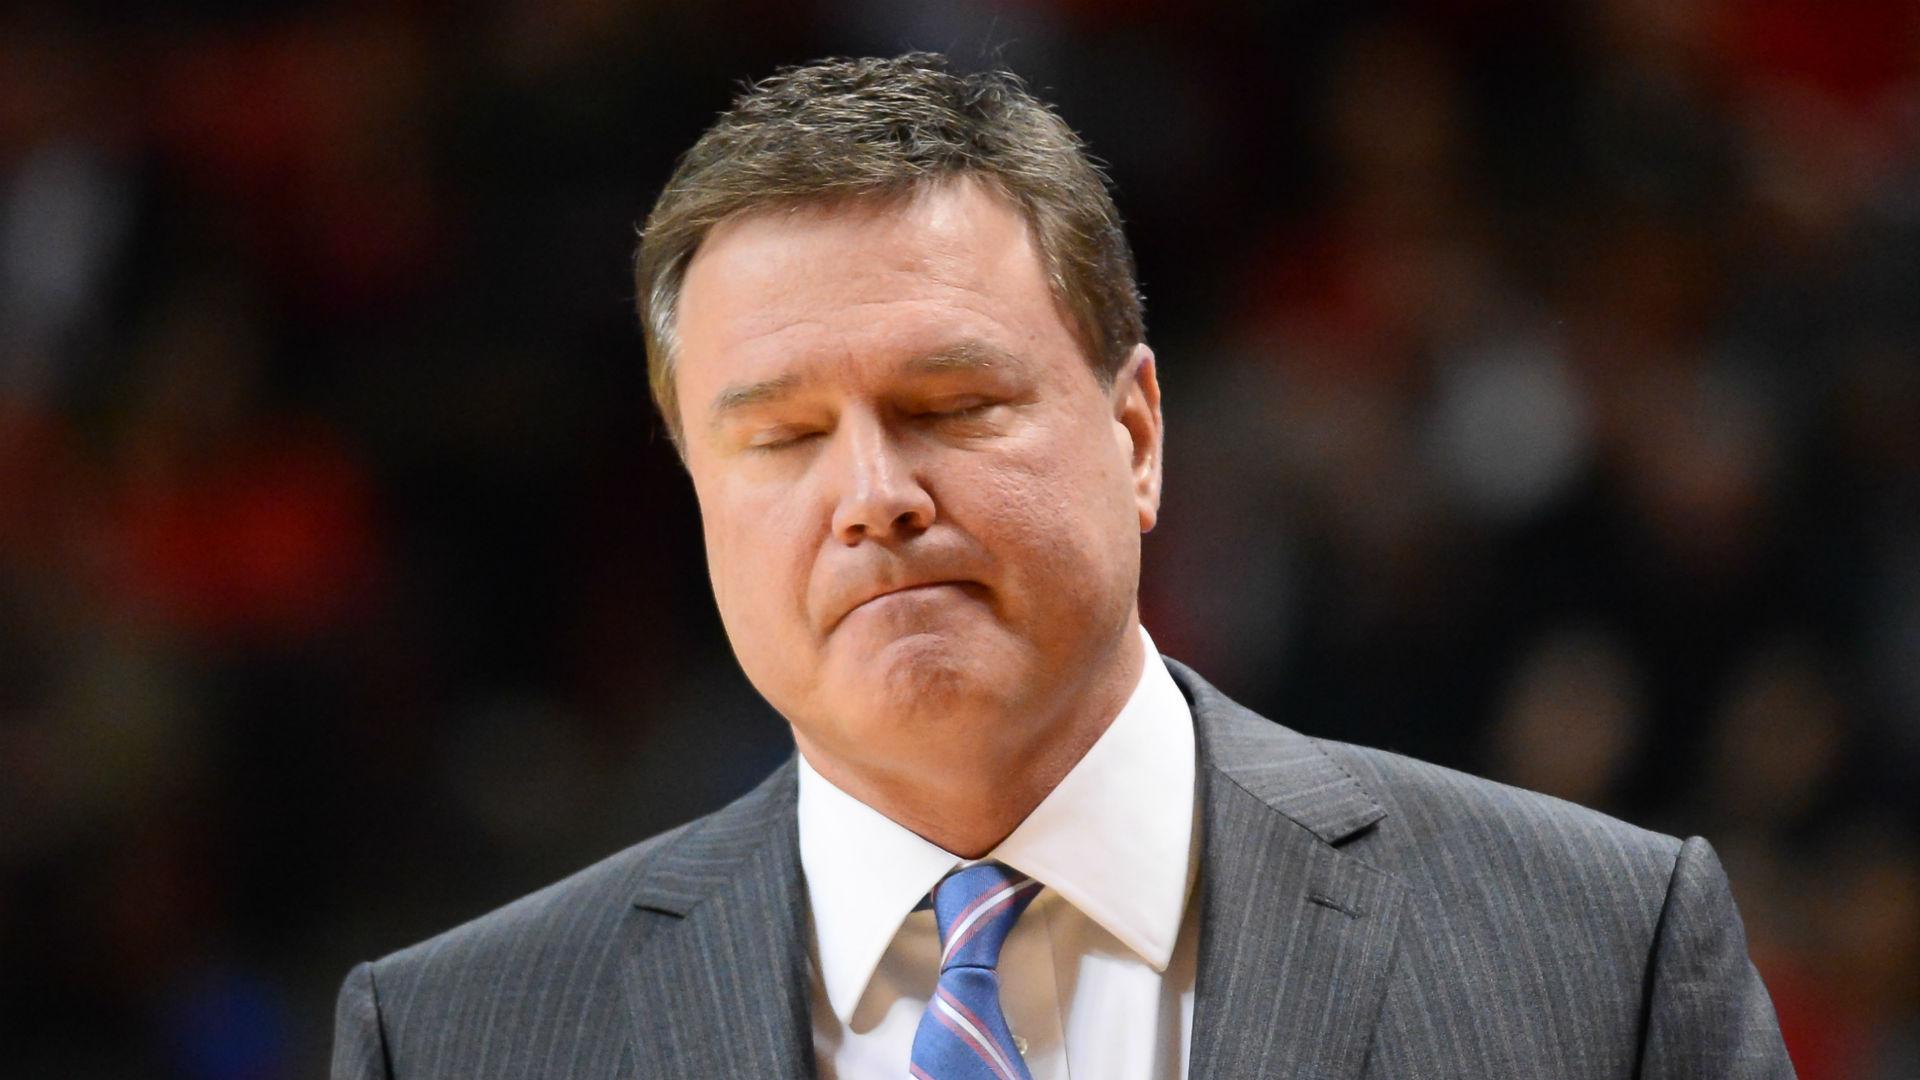 Nine undefeated teams remain after No. 2 Kansas falls to Washington